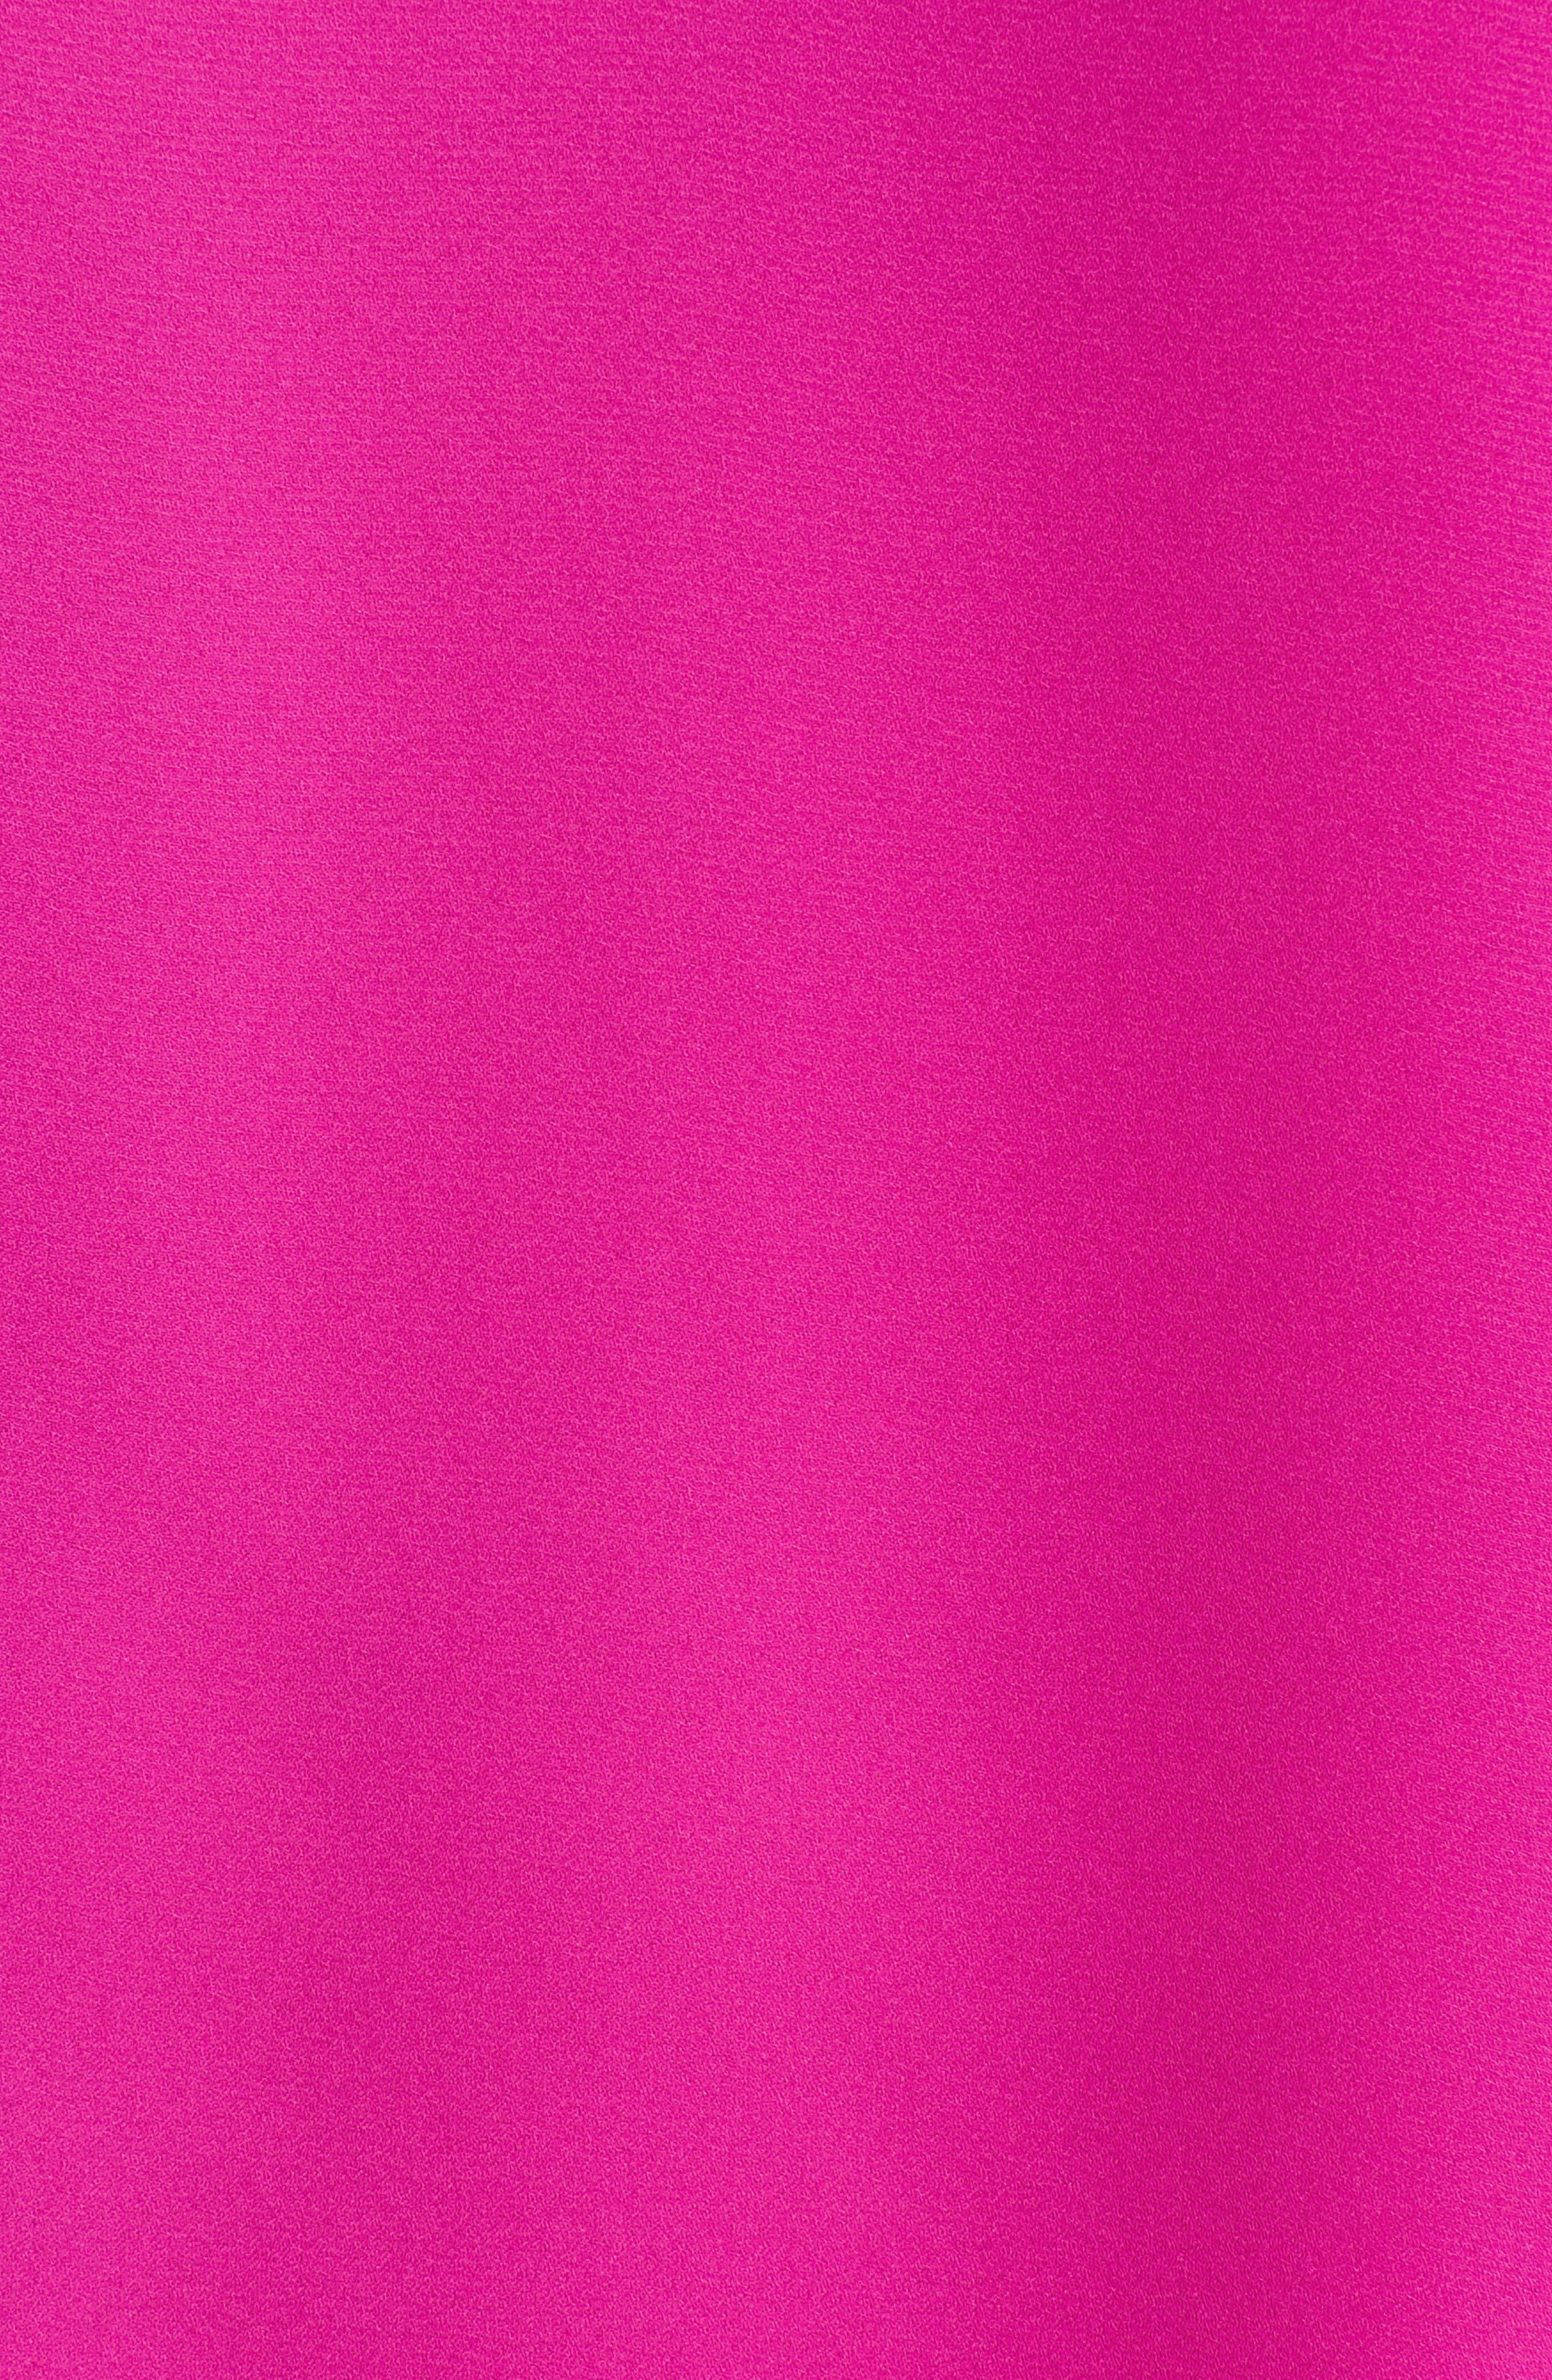 Ruffle Sleeve V-Neck Blouse,                             Alternate thumbnail 5, color,                             686-Pink Nouveau